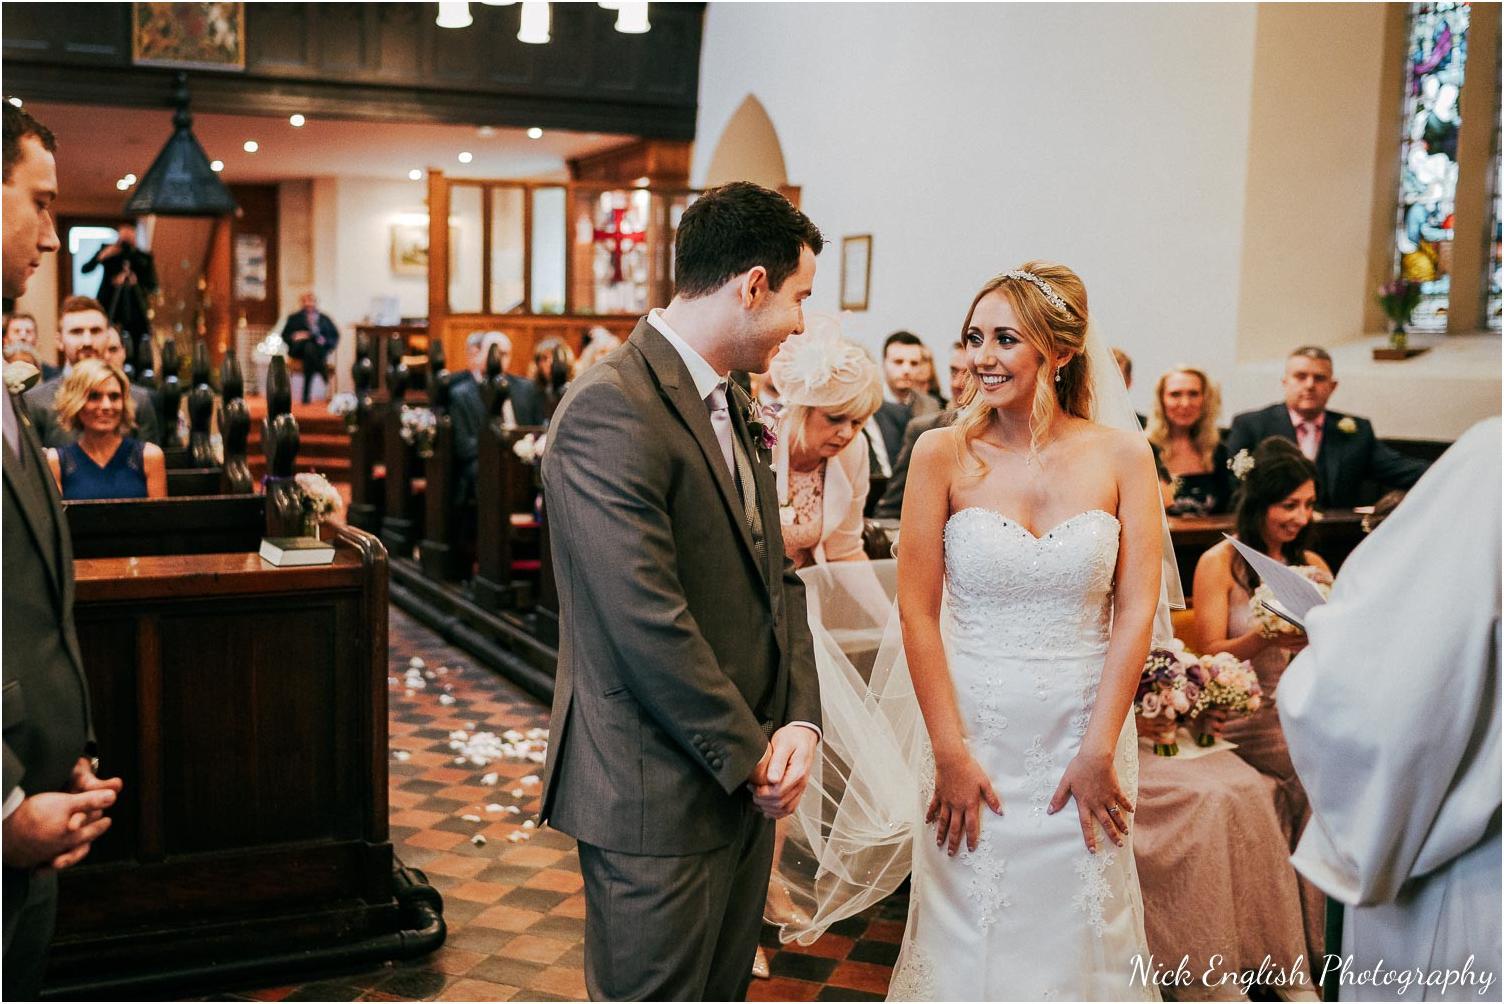 Mitton_Hall_Wedding_Photographer_2018-60.jpg